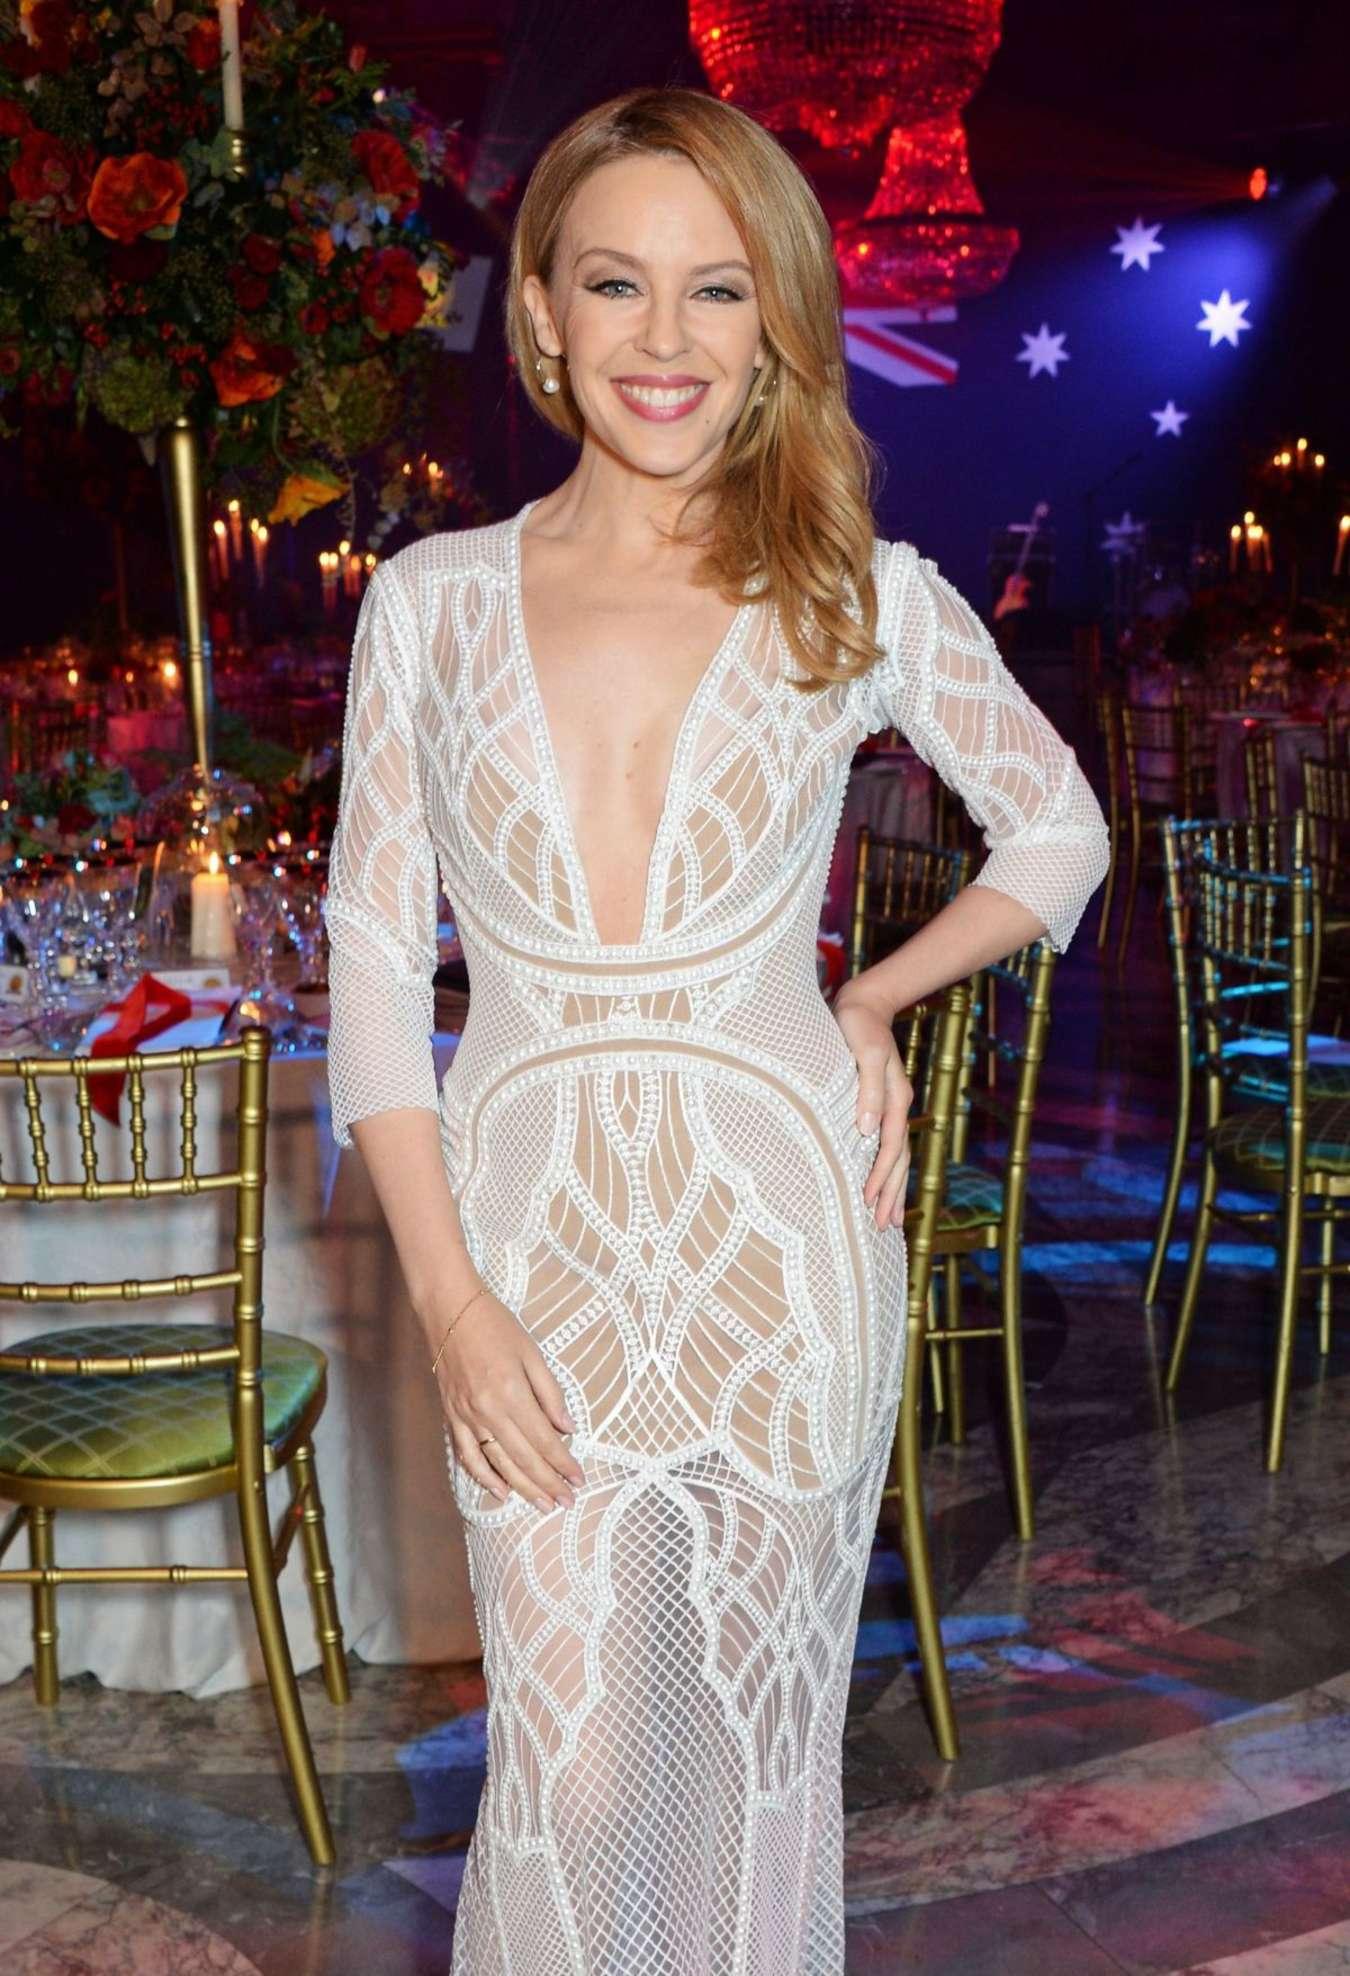 Kylie Minogue Australia Day Gala Dinner In London Gotceleb